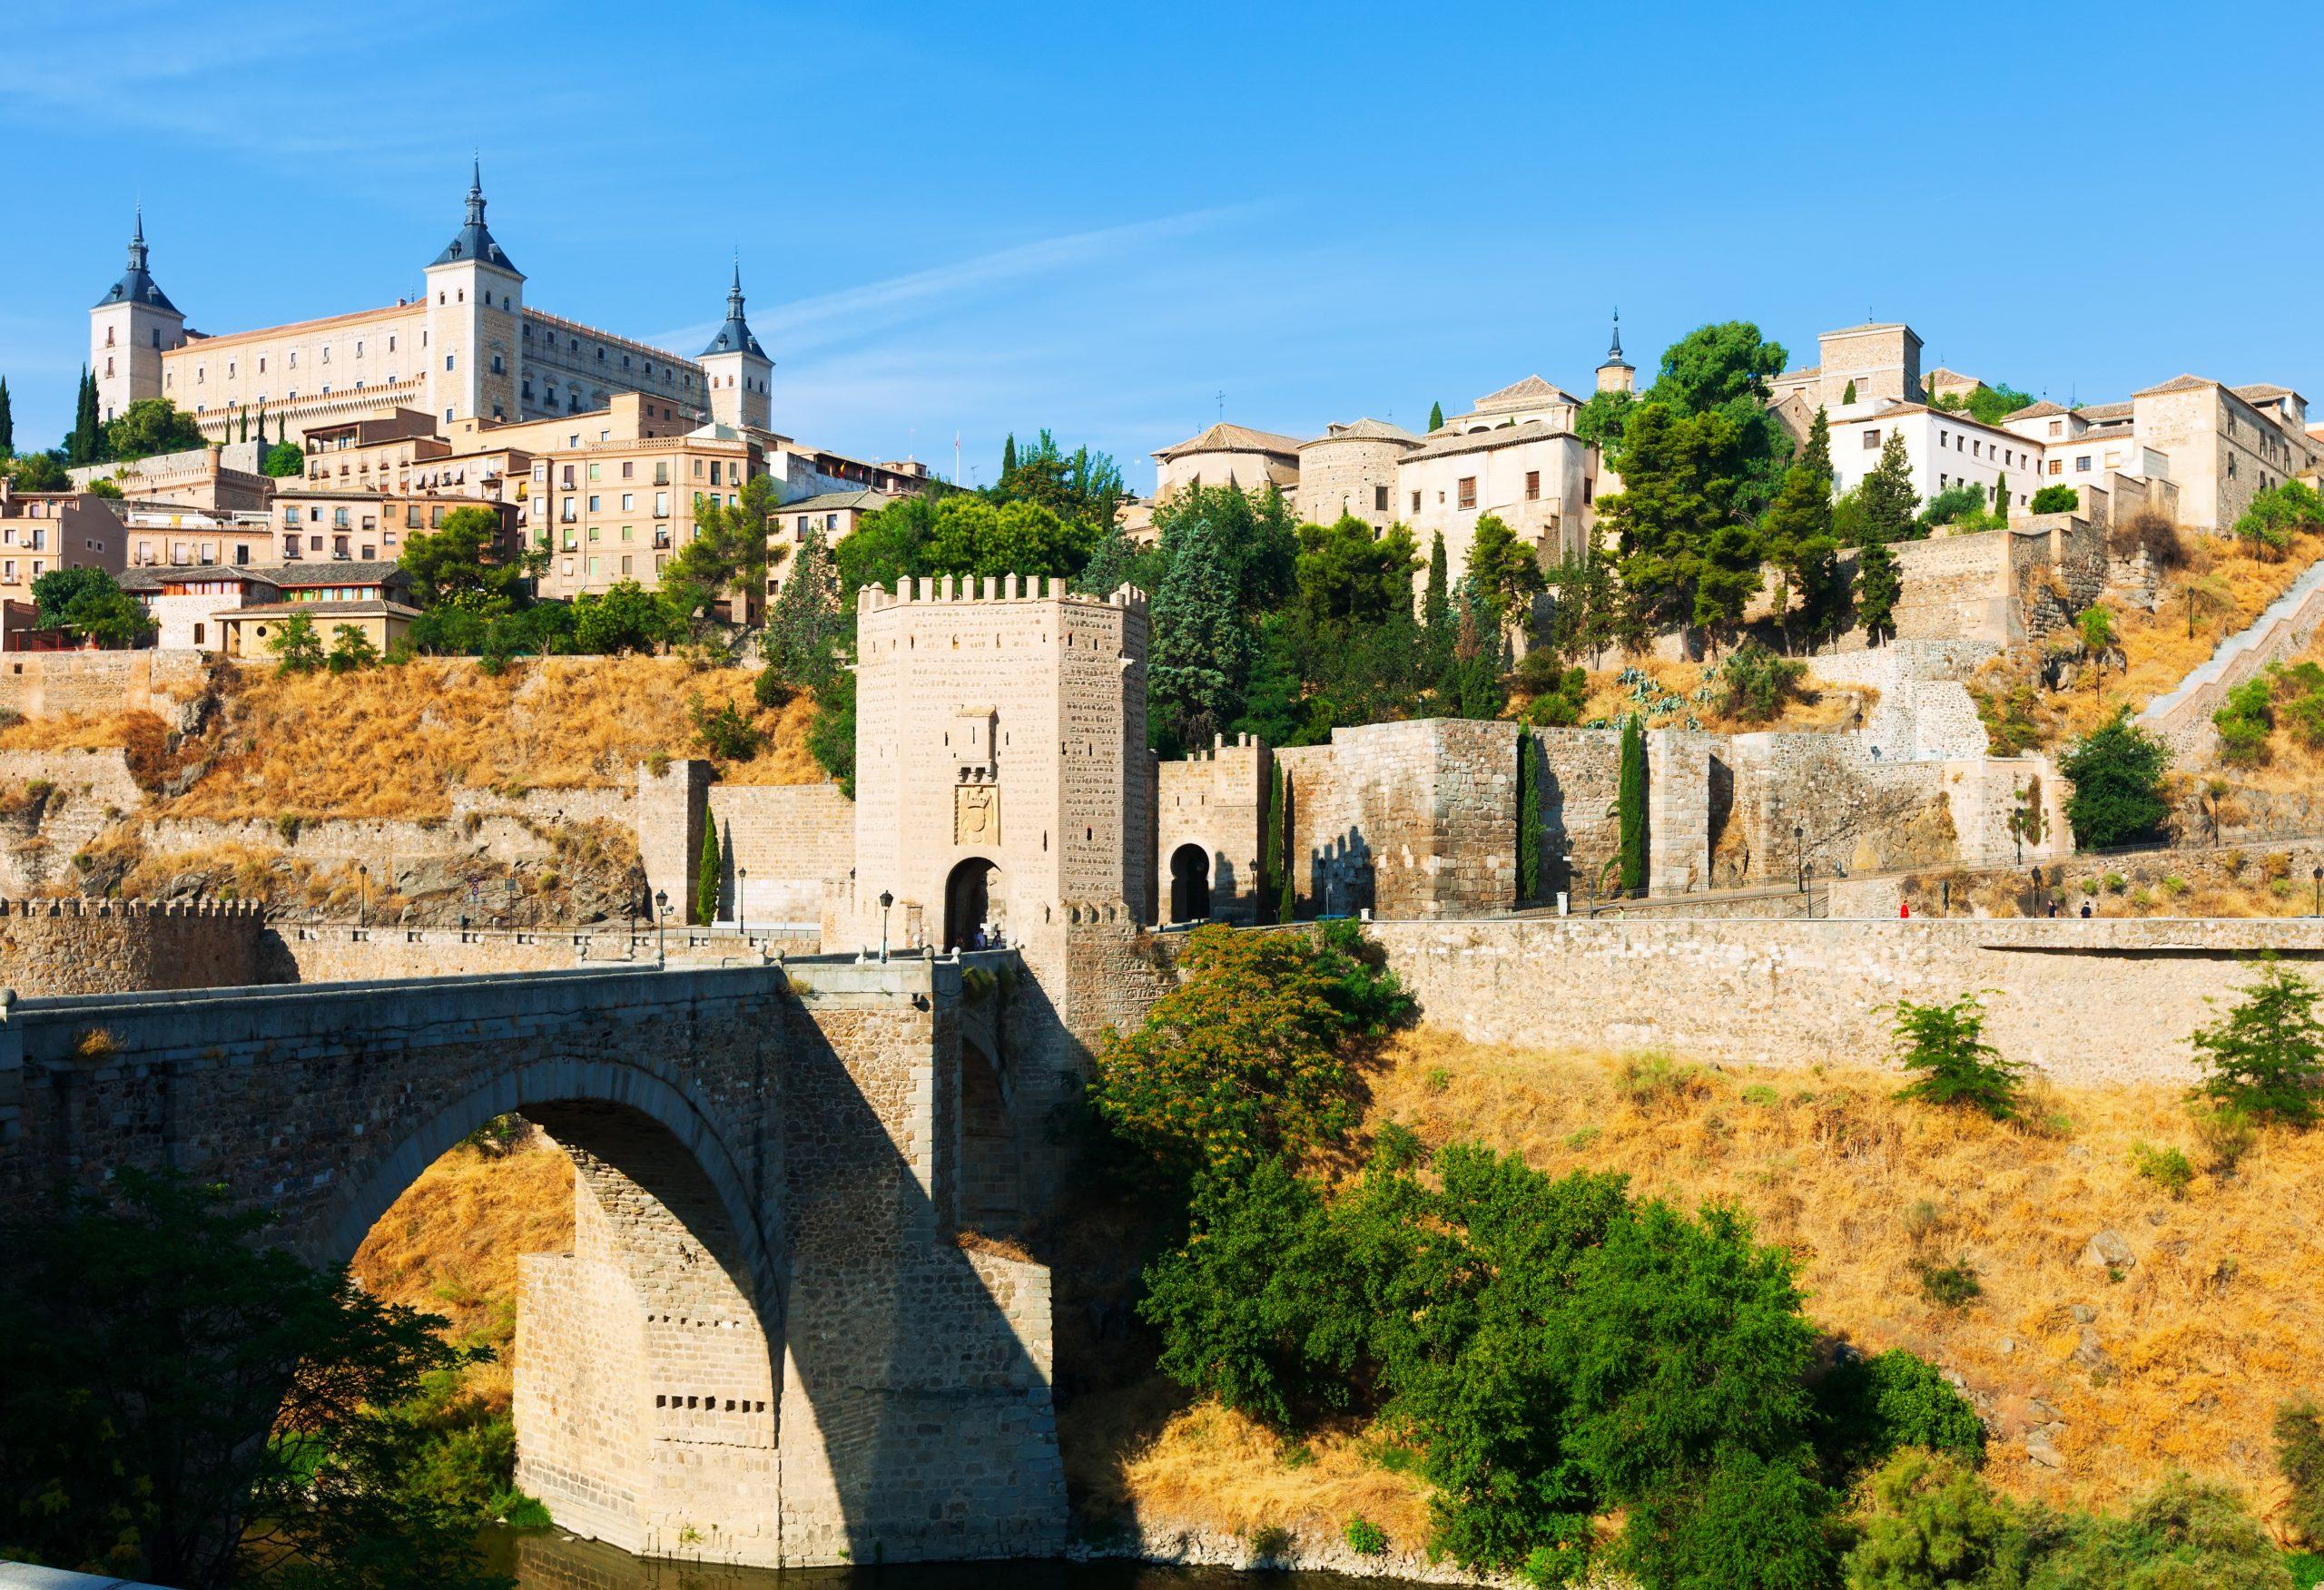 Excursiones periodicas a Toledo